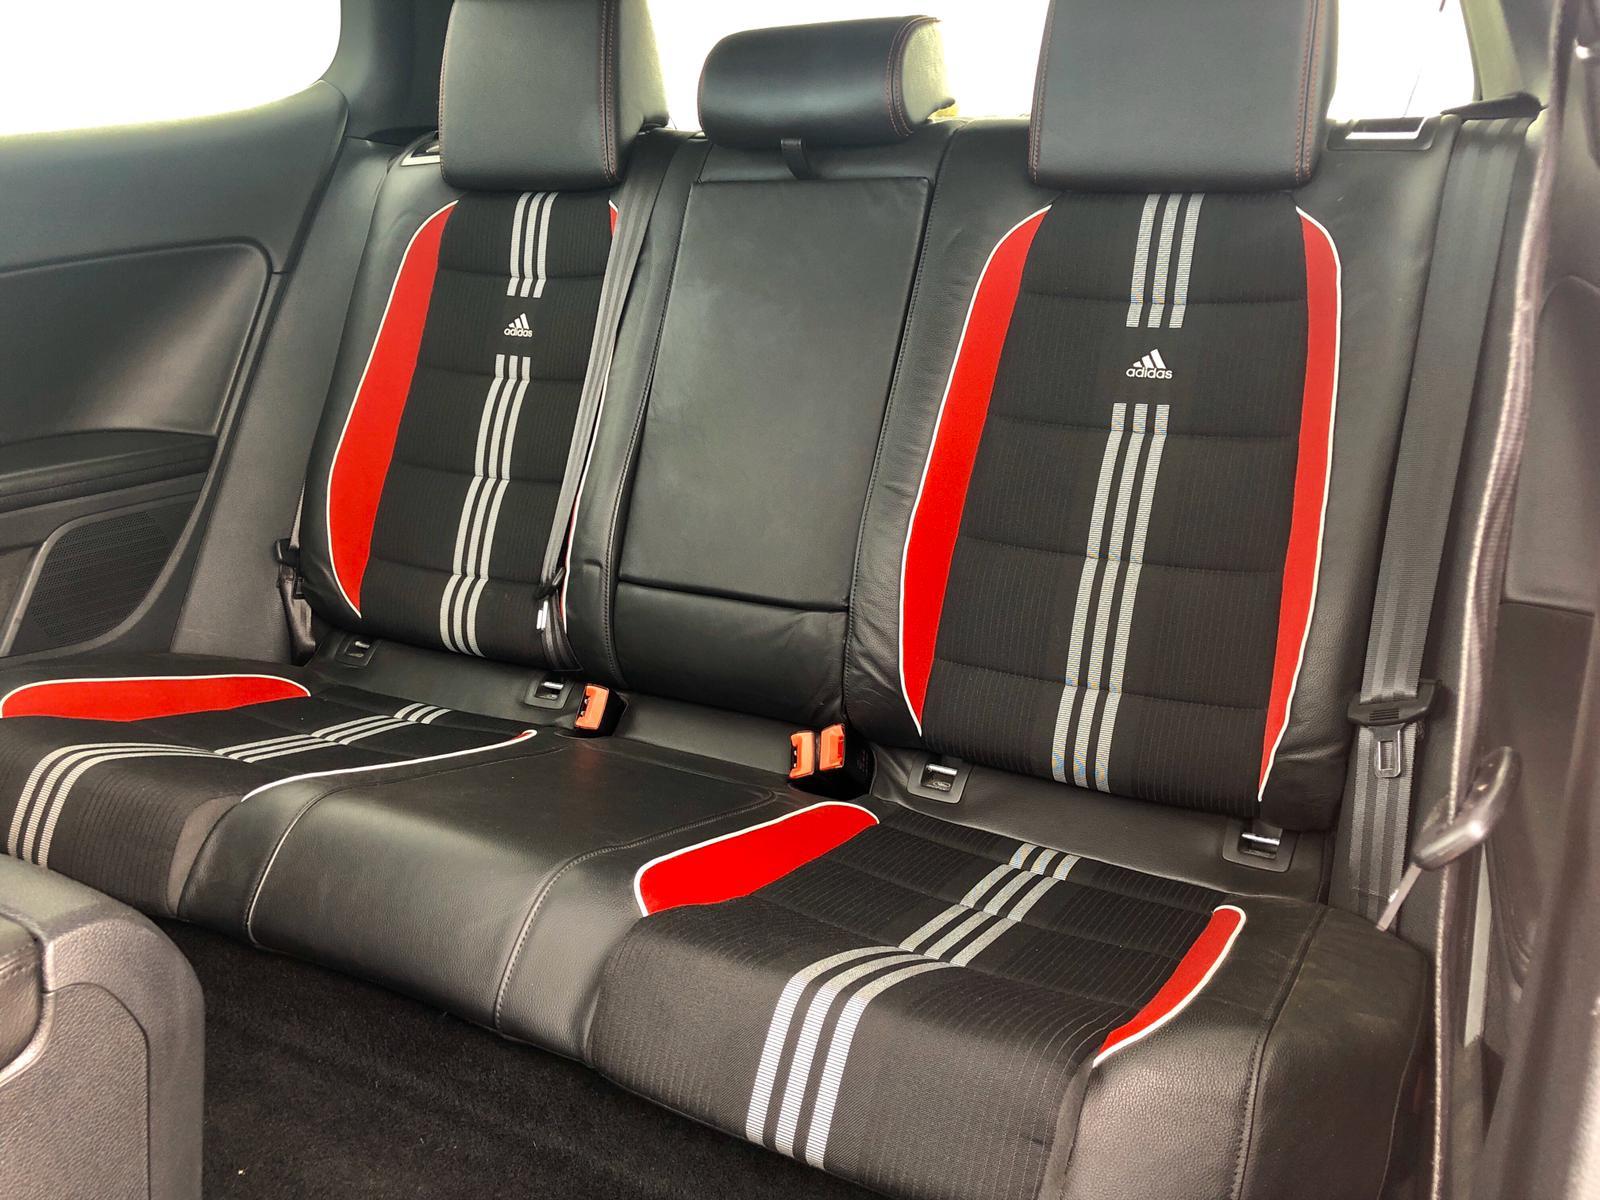 Enajenar Ondular Egoísmo  Sprzedany: Volkswagen Golf VI GTI Adidas Edition 2.0 TSI 211KM – 2012r. -  VAGcars.pl